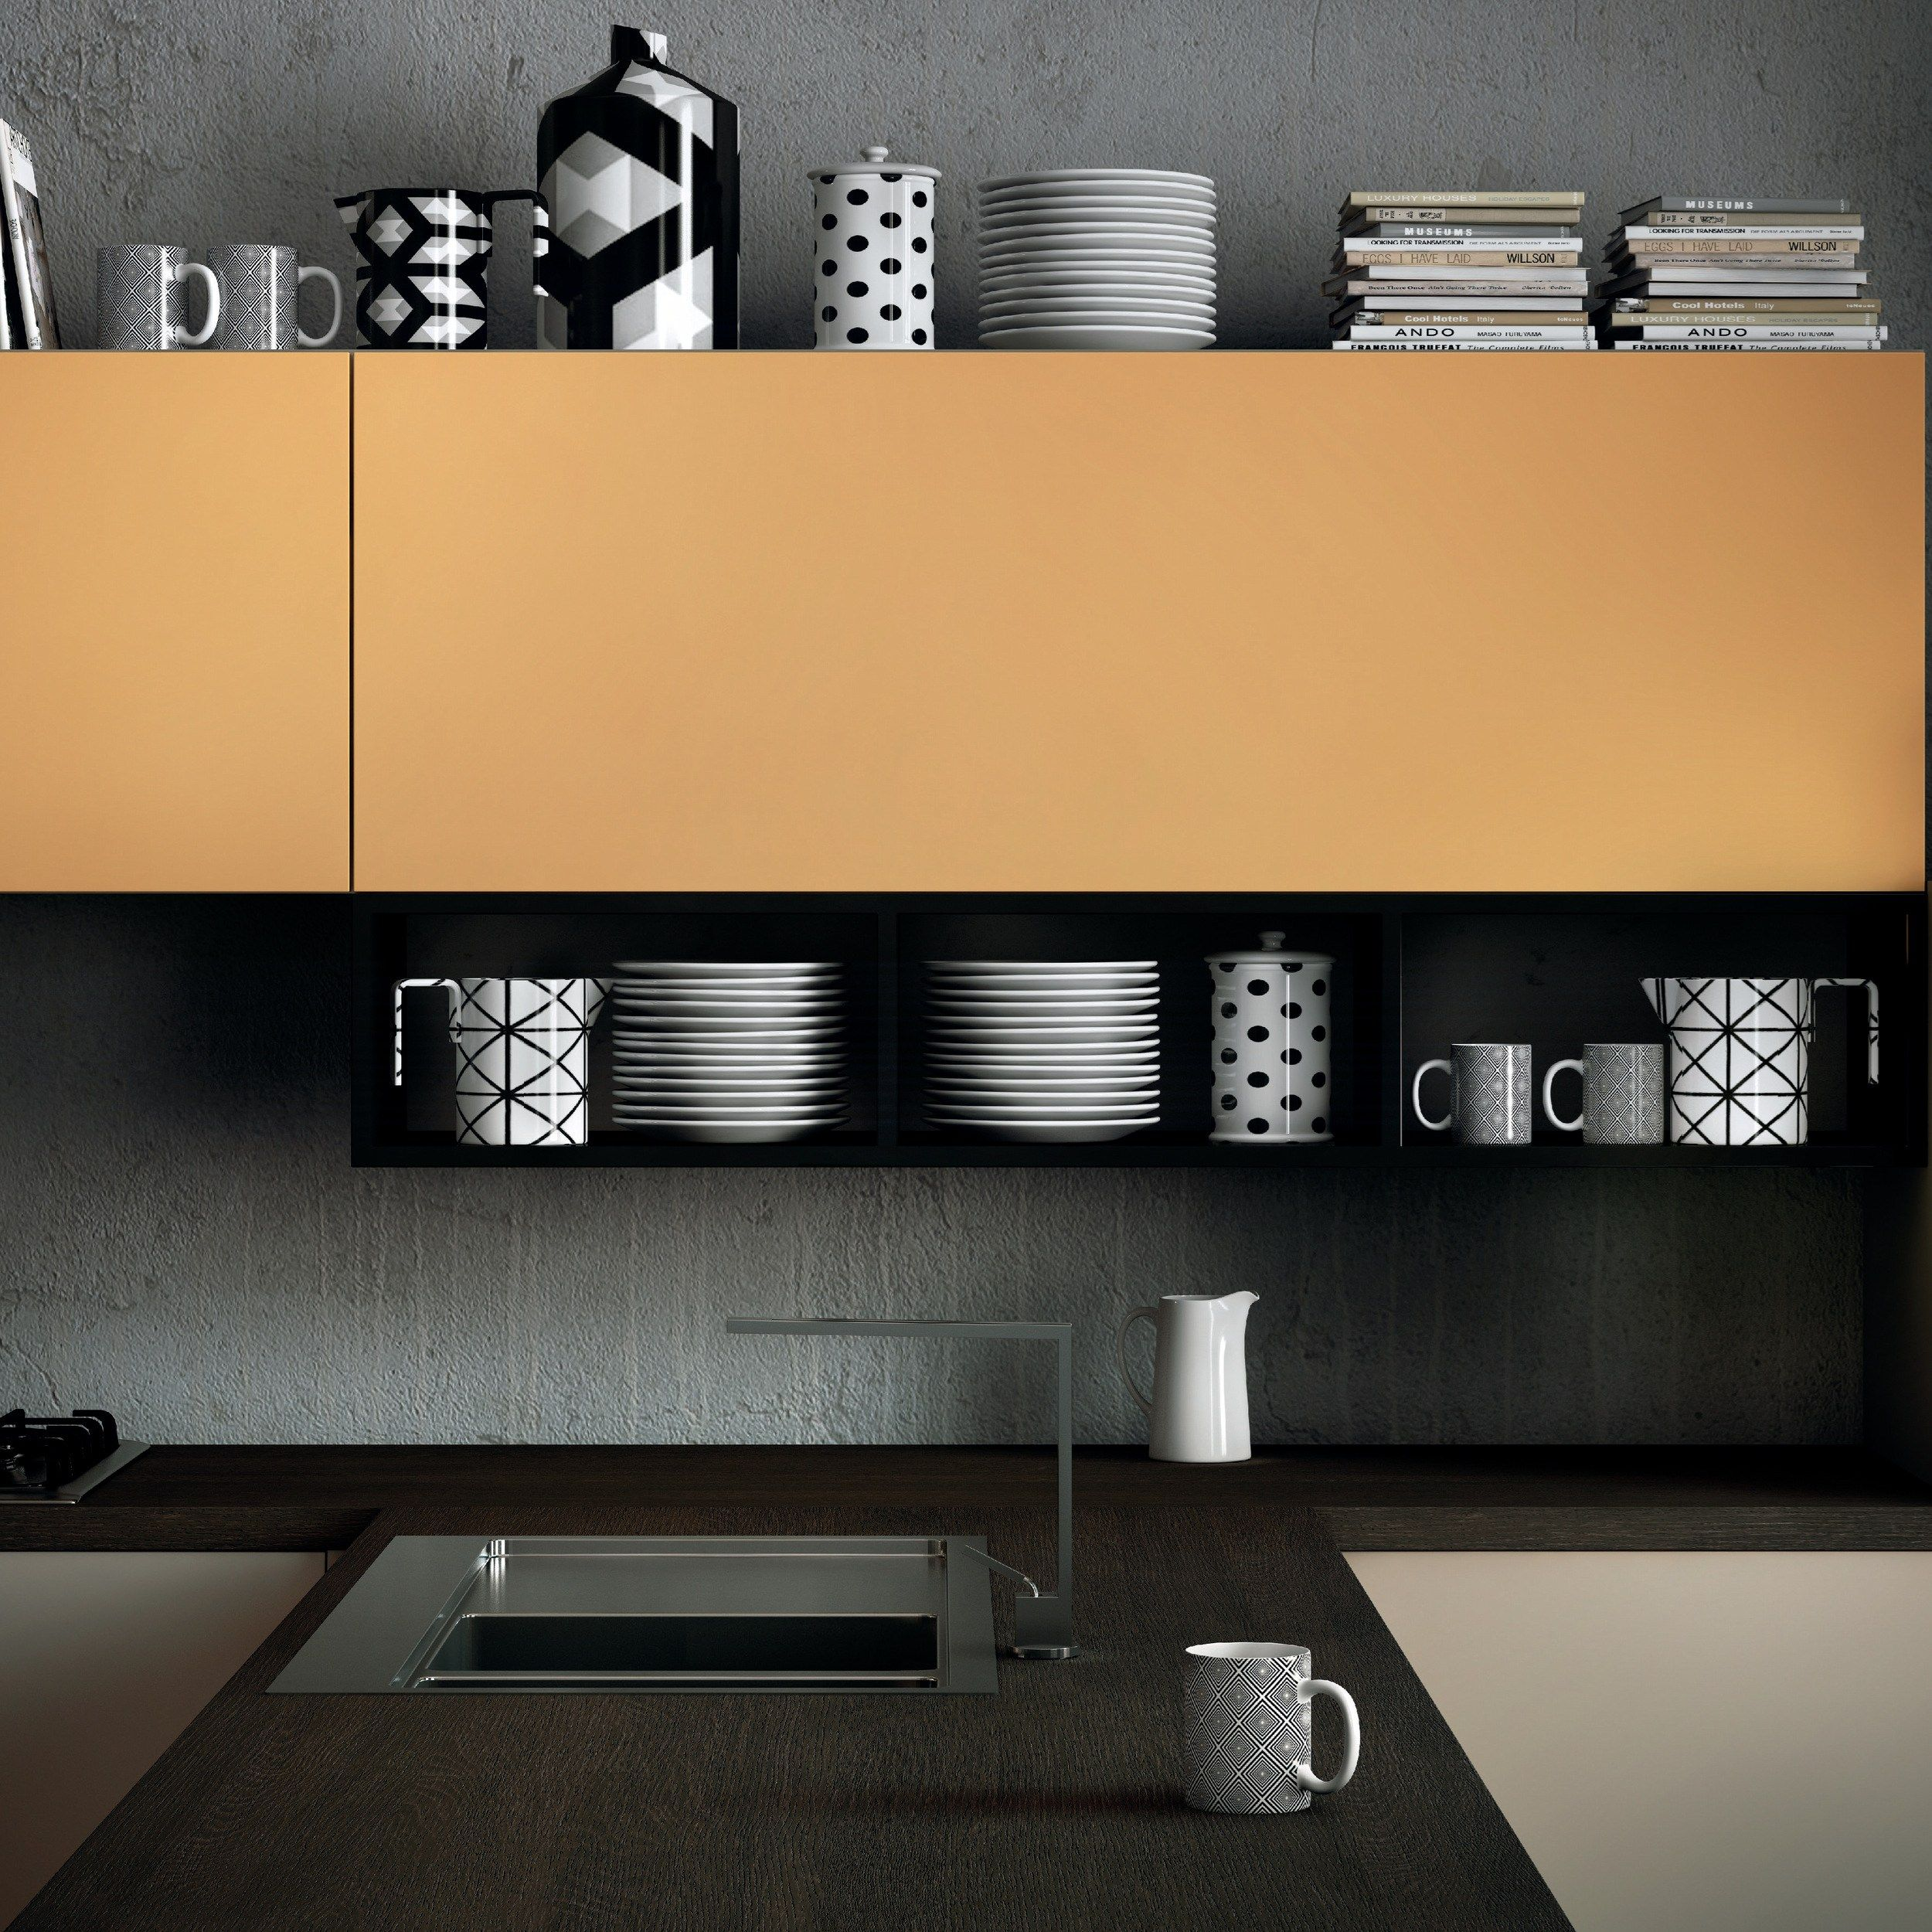 Cucina componibile MILANO by Del Tongo #design Prospero Rasulo ...